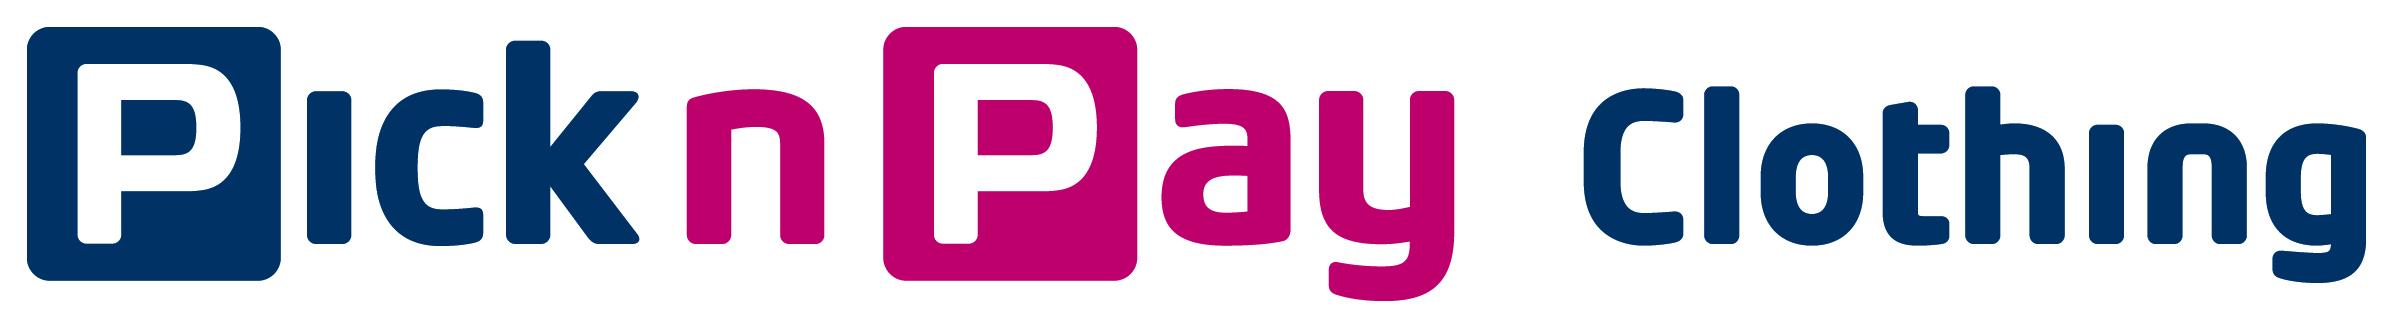 Pick n Pay Clothing Parow